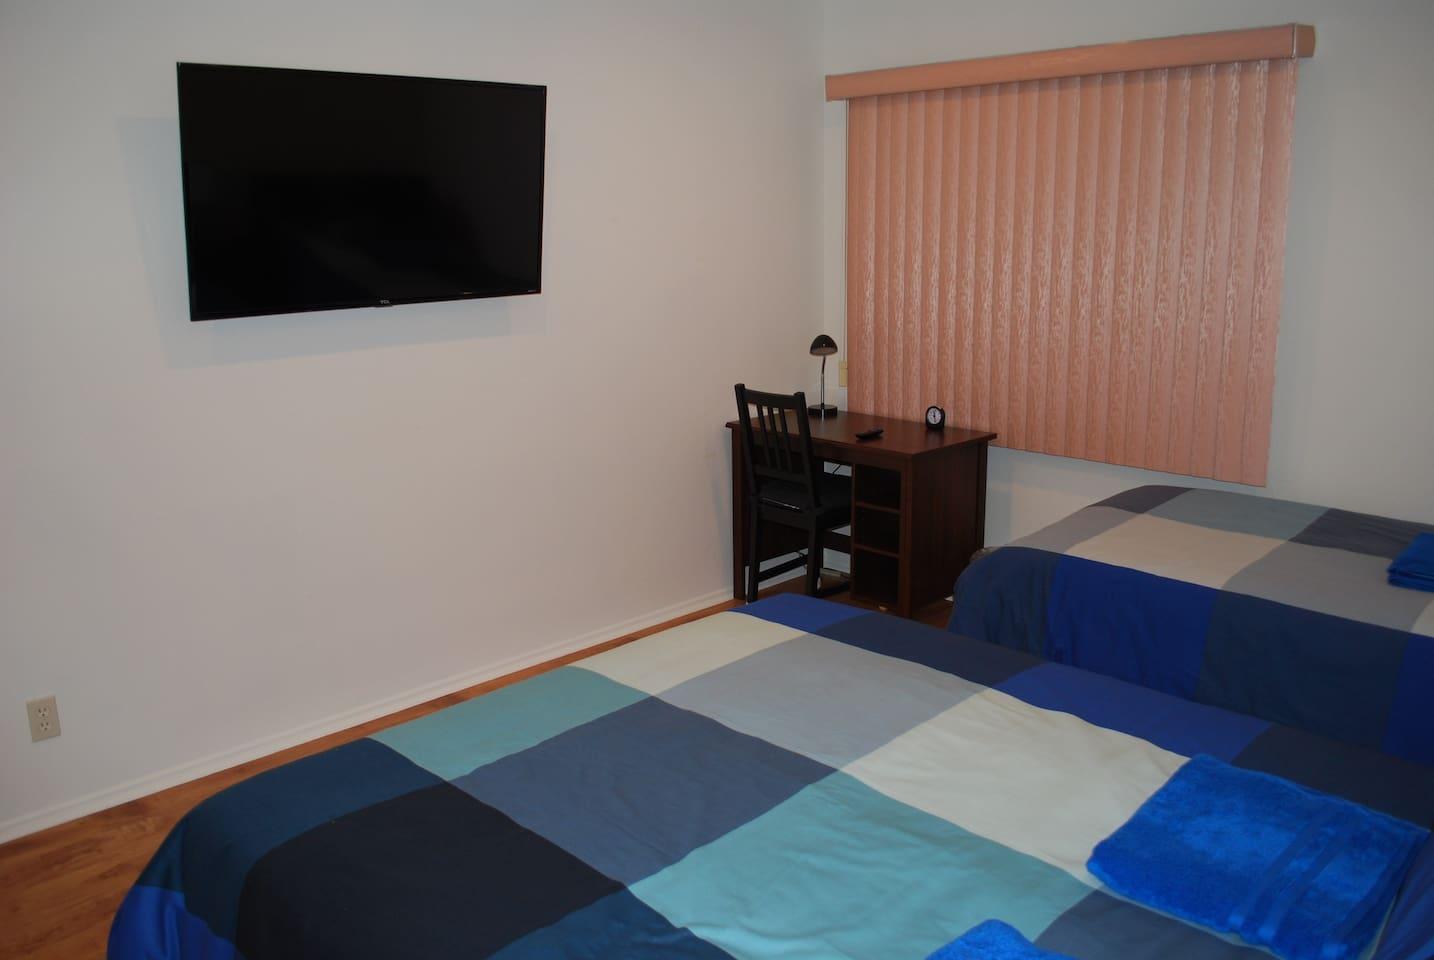 Blue Room/ pvt bth/ prkg/ all new/ TV/near freeway